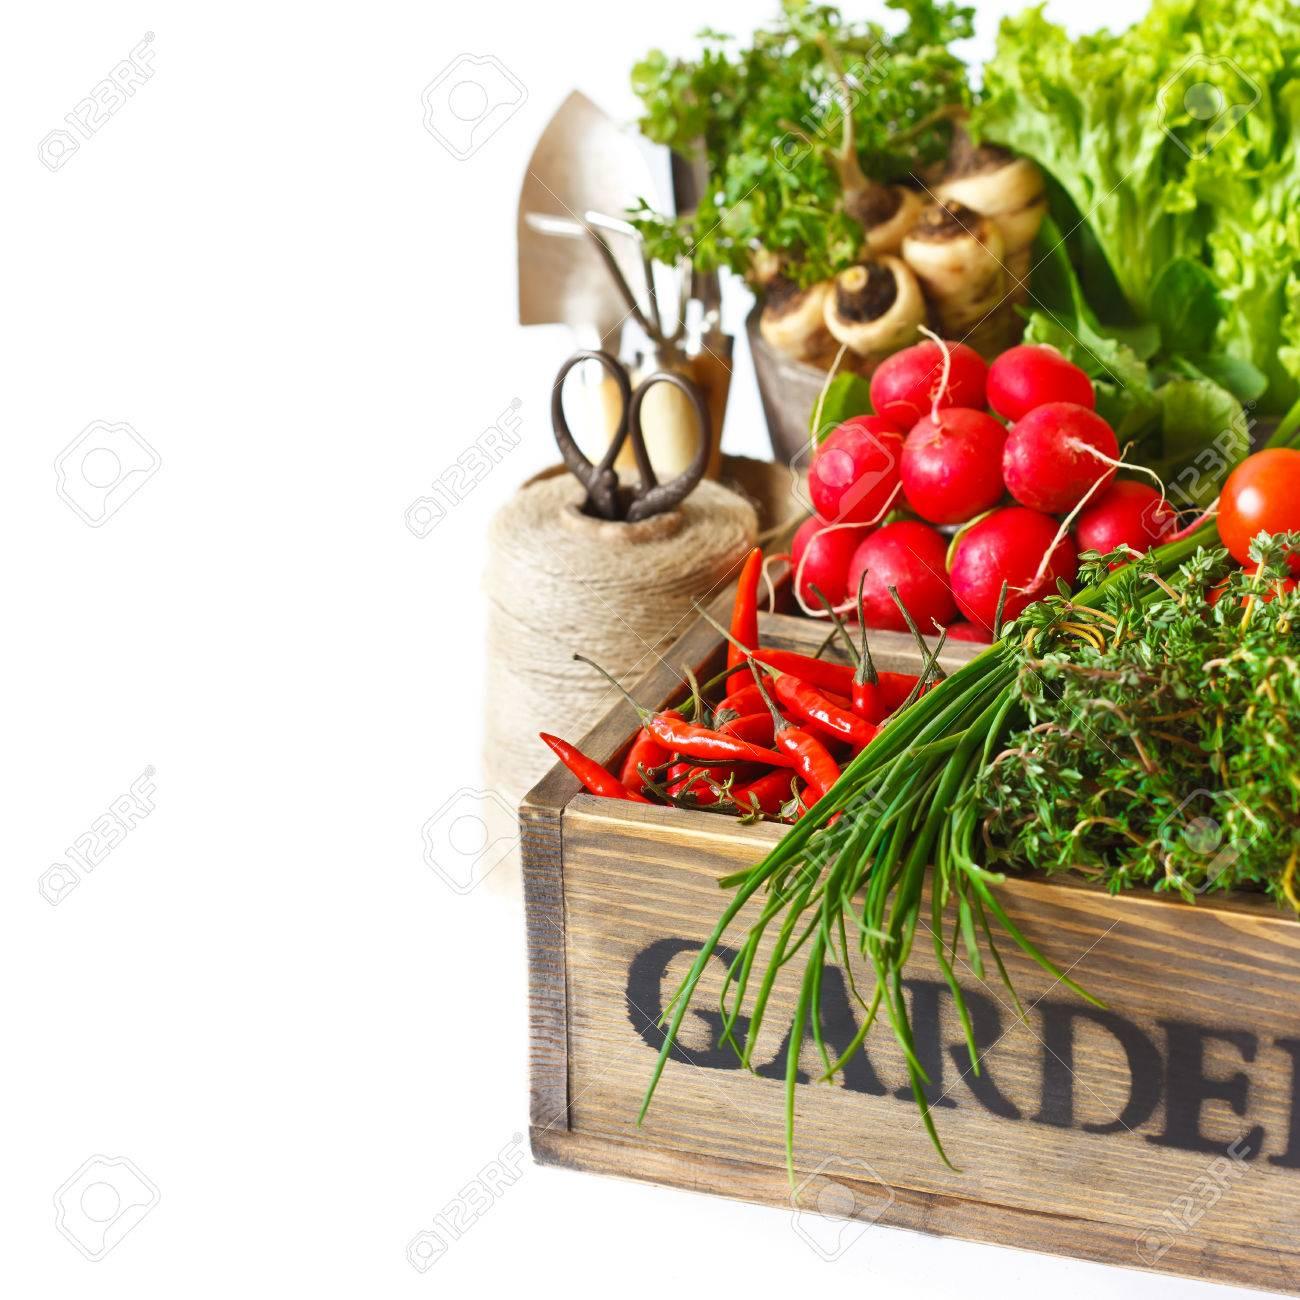 Fresh Organic Kitchen Garden Vegetables On Vintage Wooden Box On A ...